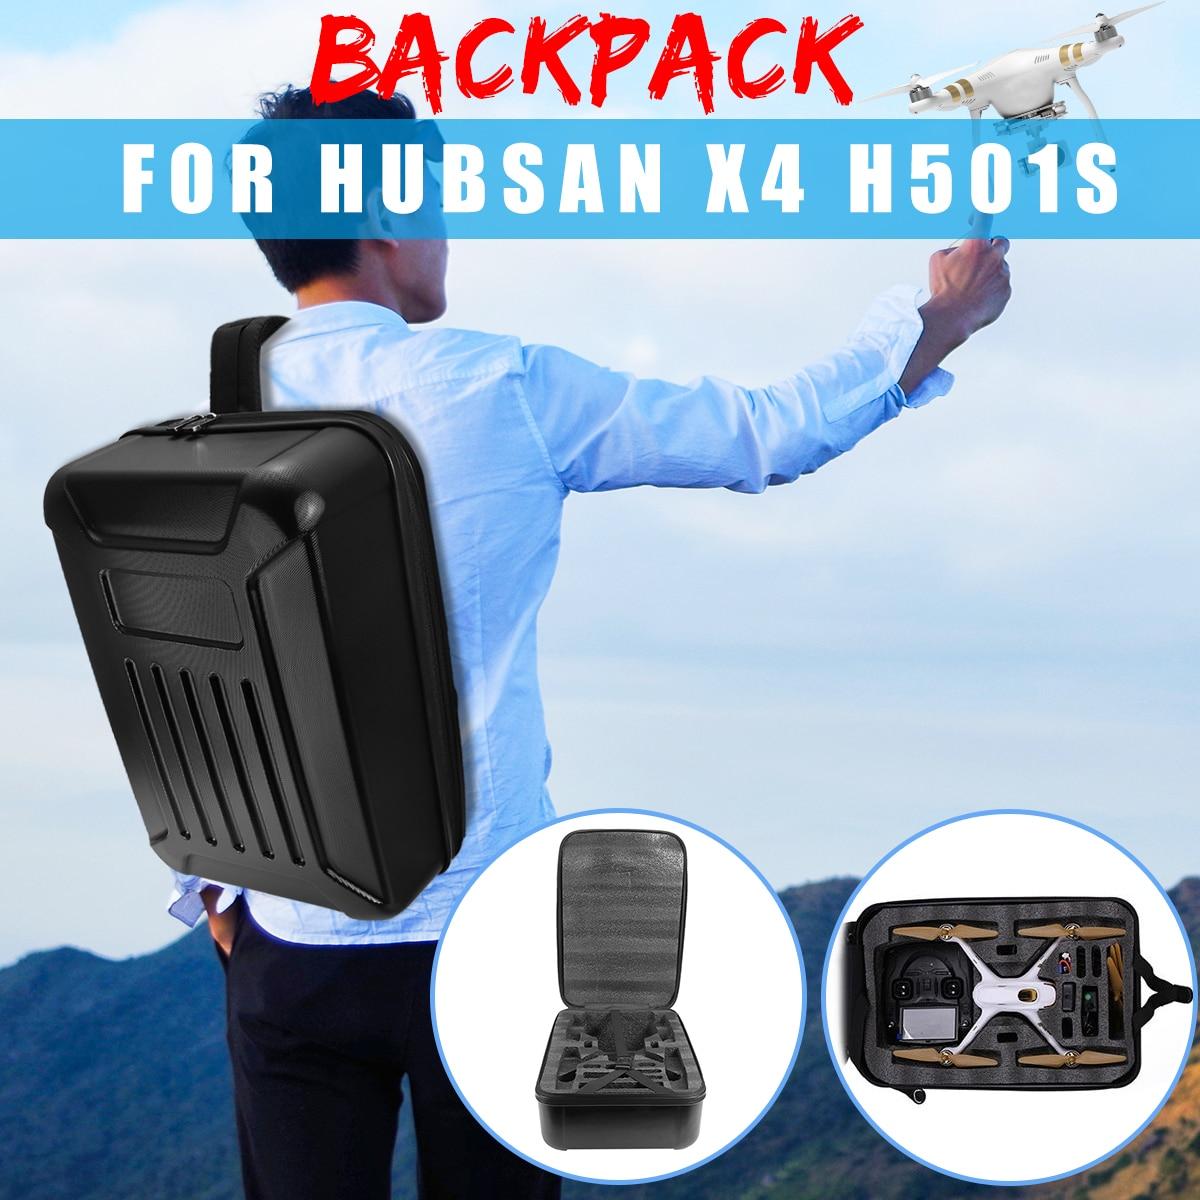 Черный Водонепроницаемый Hard Shell рюкзак сумка коробка для Hubsan X4 H501S и H501C Камера Drone чехол